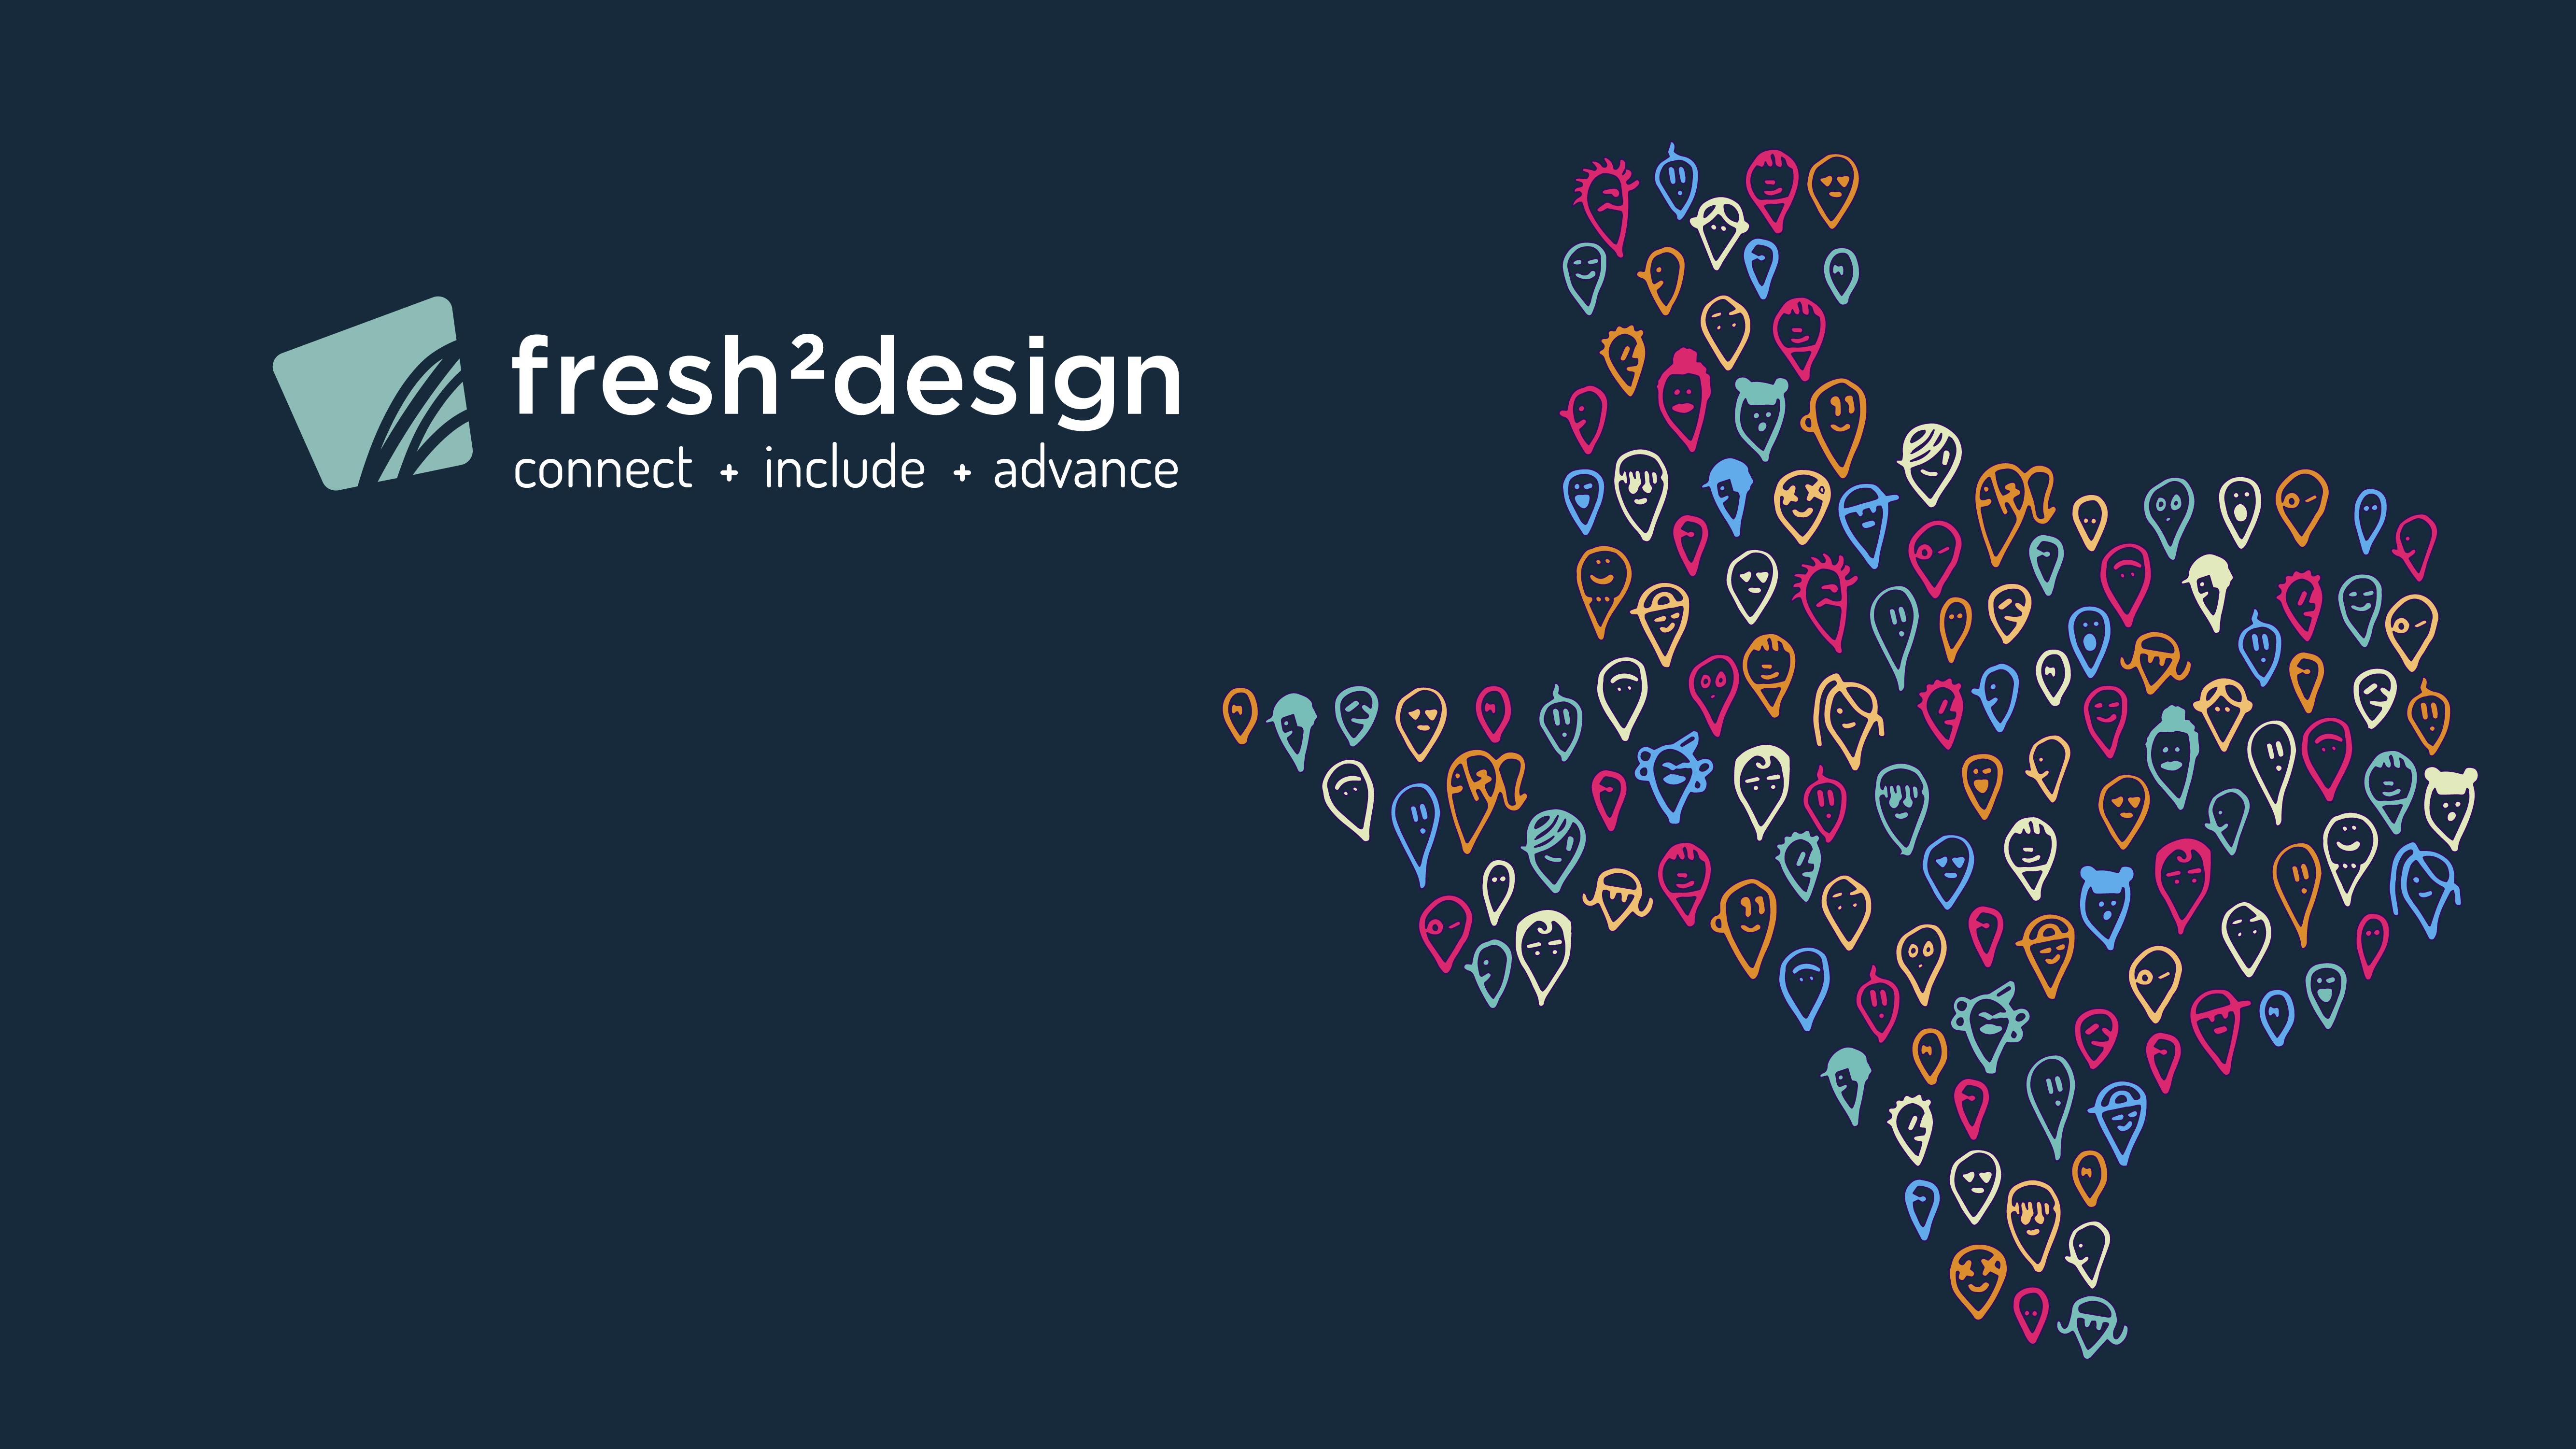 fresh2design - Dallas, TX